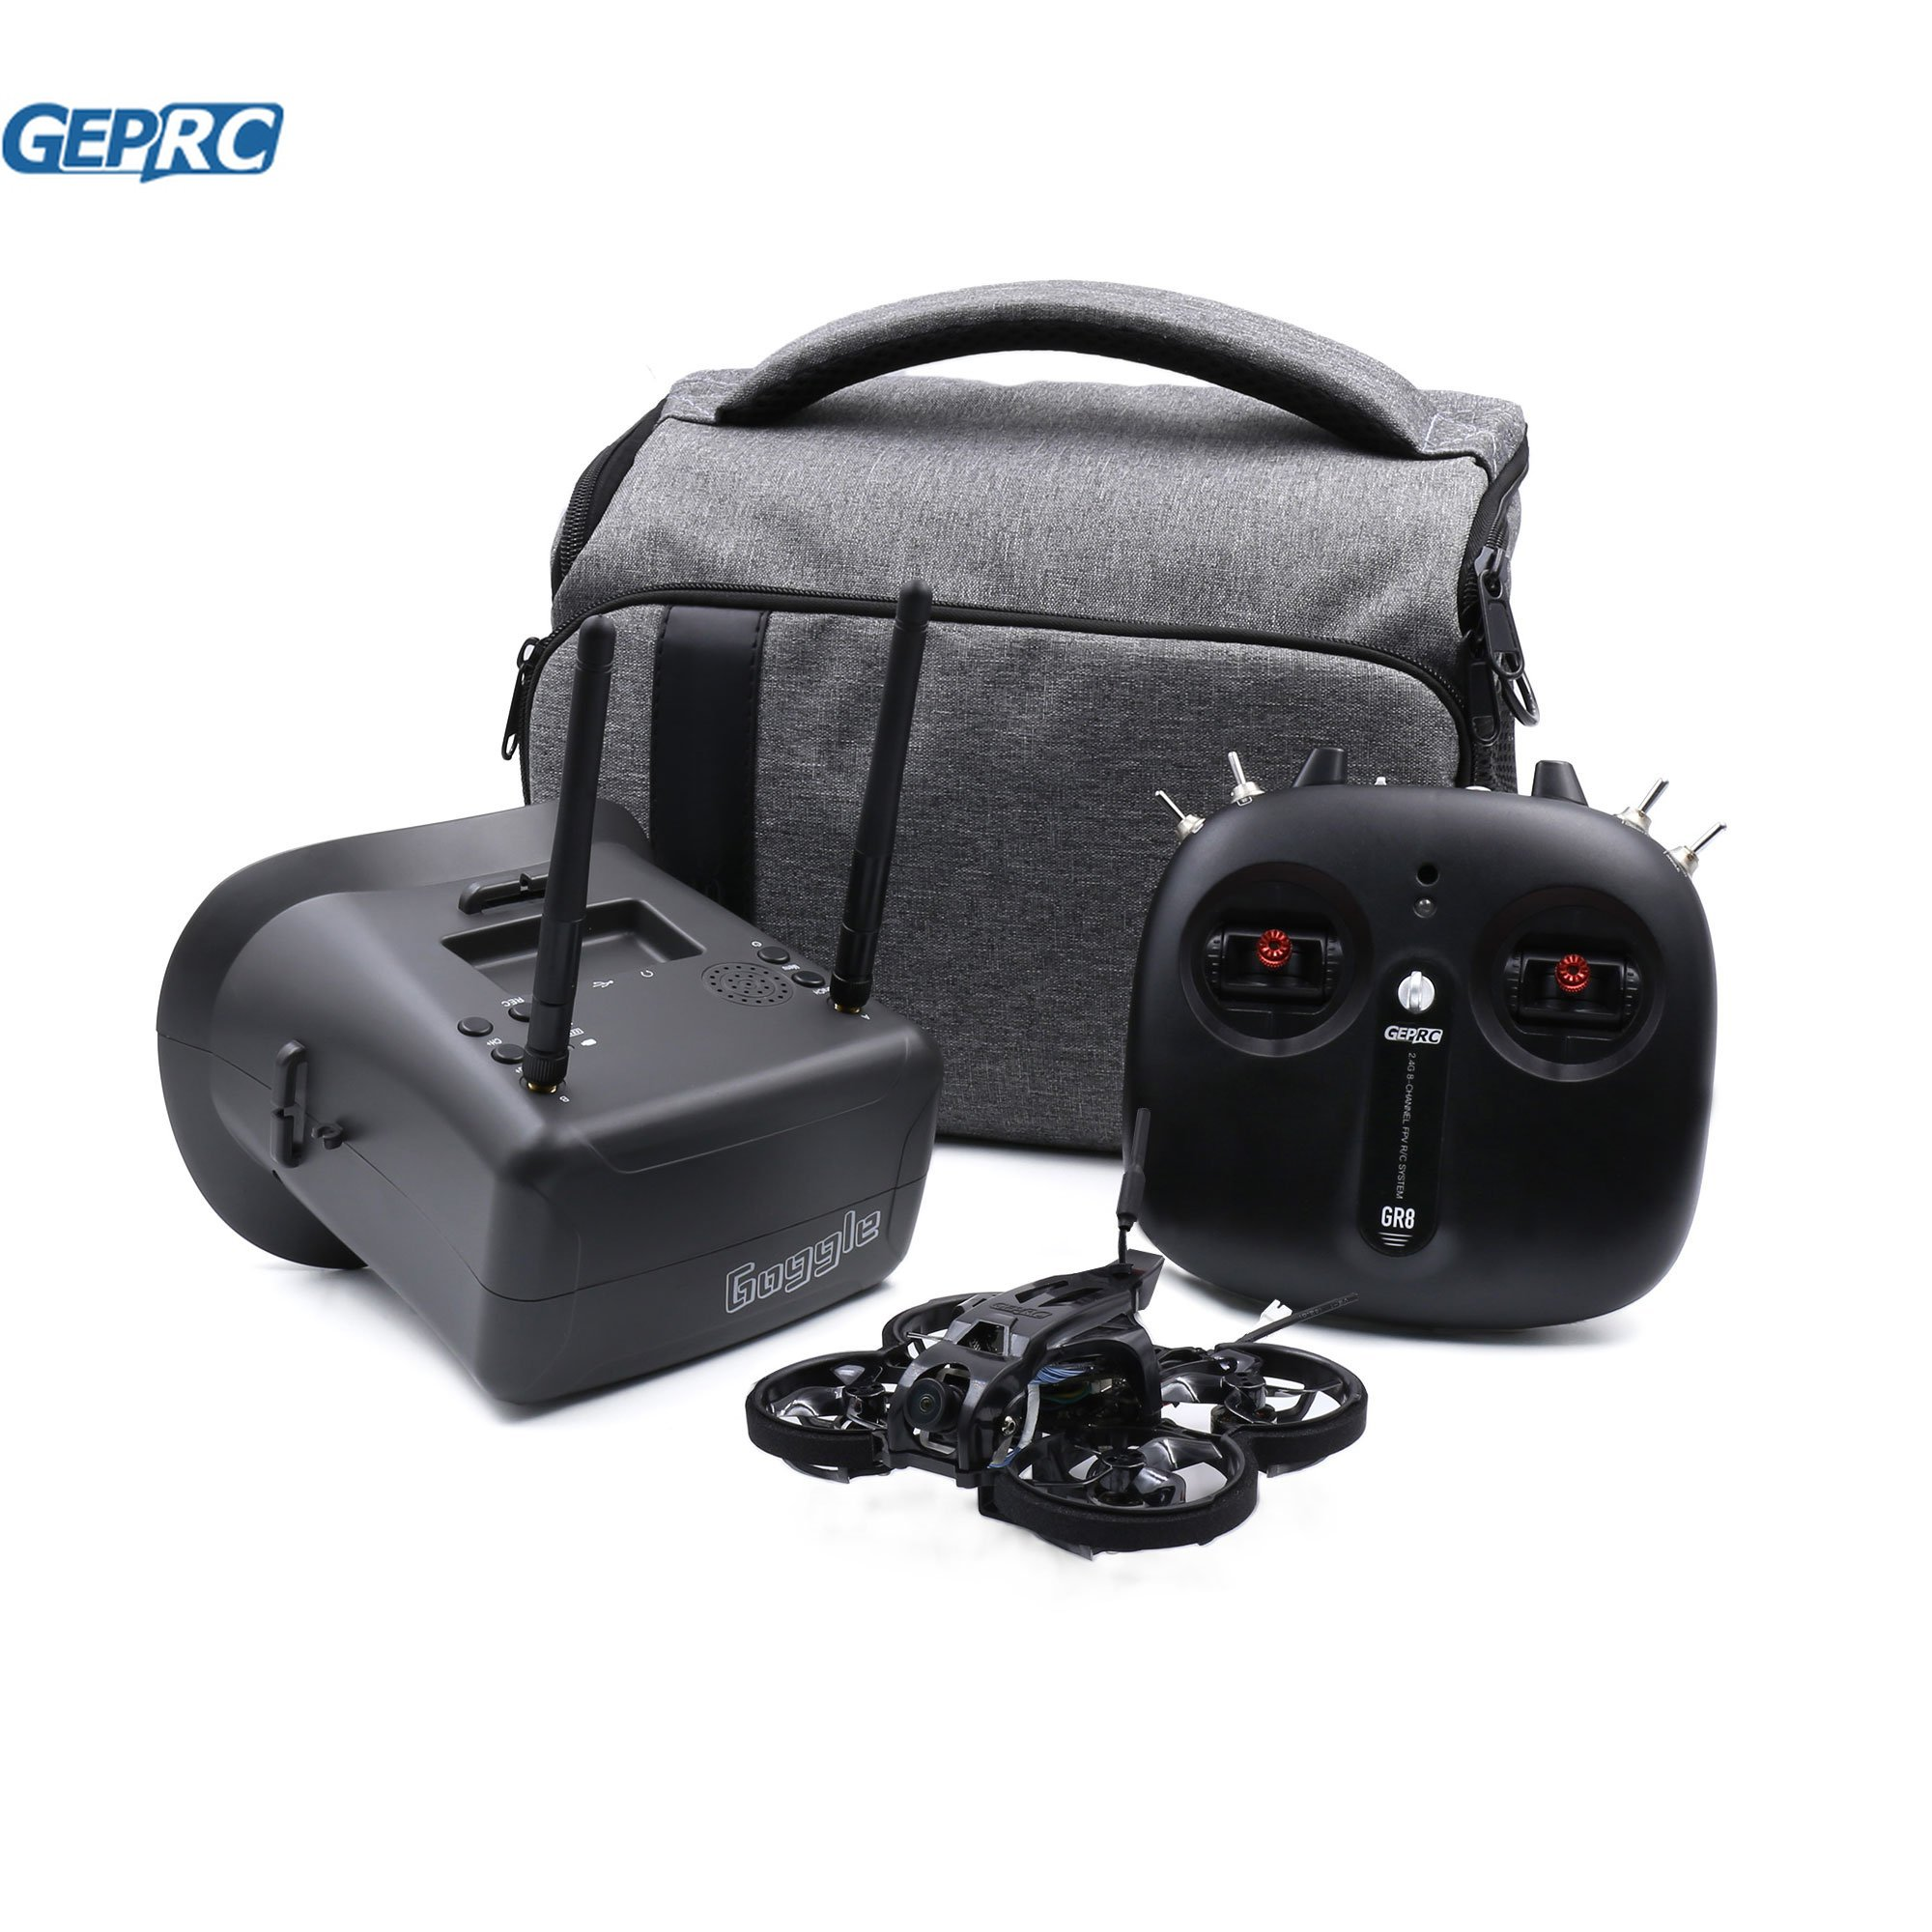 GEPRC-Dron TinyGO 4K FPV Whoop RTF con Caddx laris 4K 60fps GR1102 10000Kv GR8, mando a distancia, gafas FPV de 4,3 pulgadas